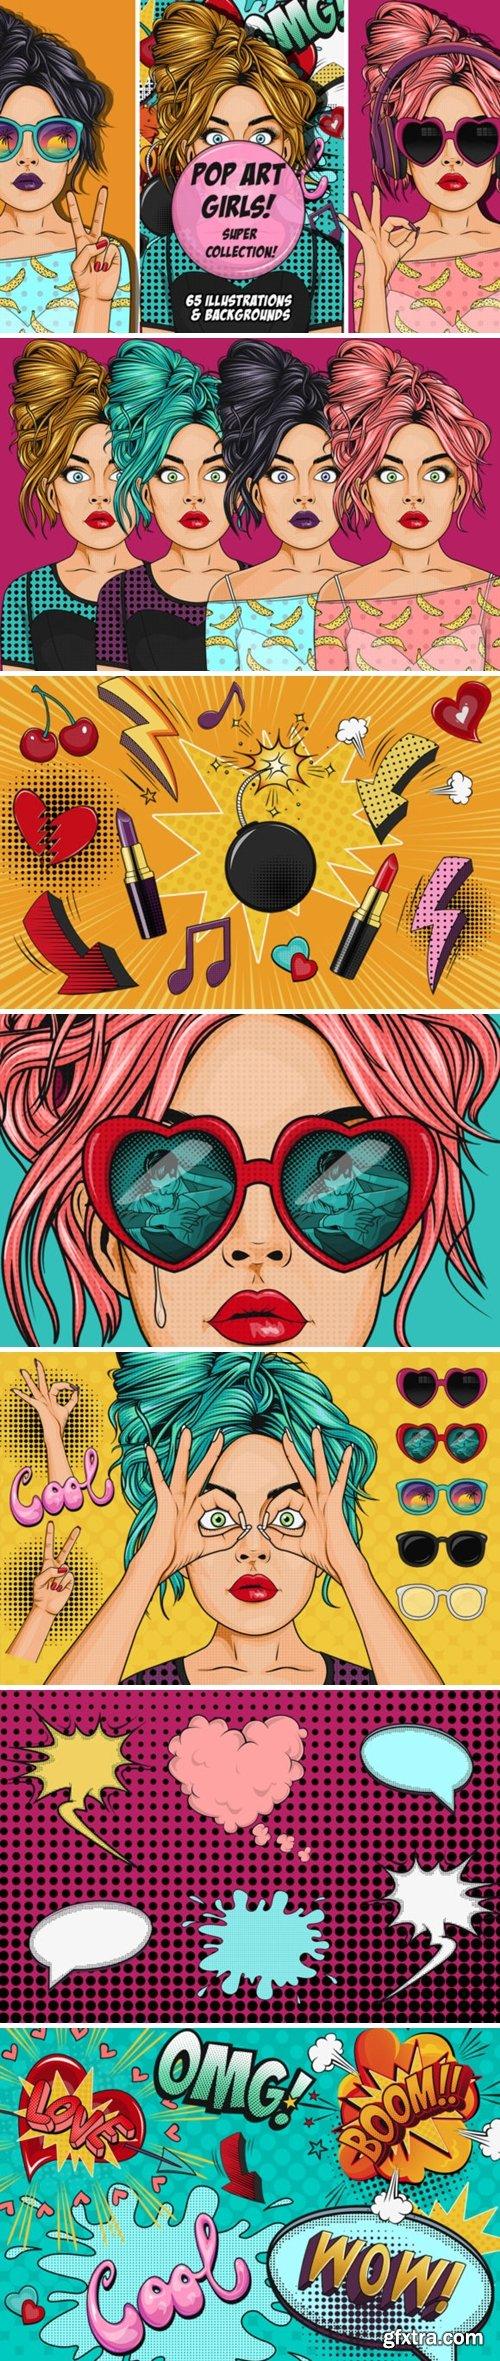 Comic Style Pop Art Girls 3625275